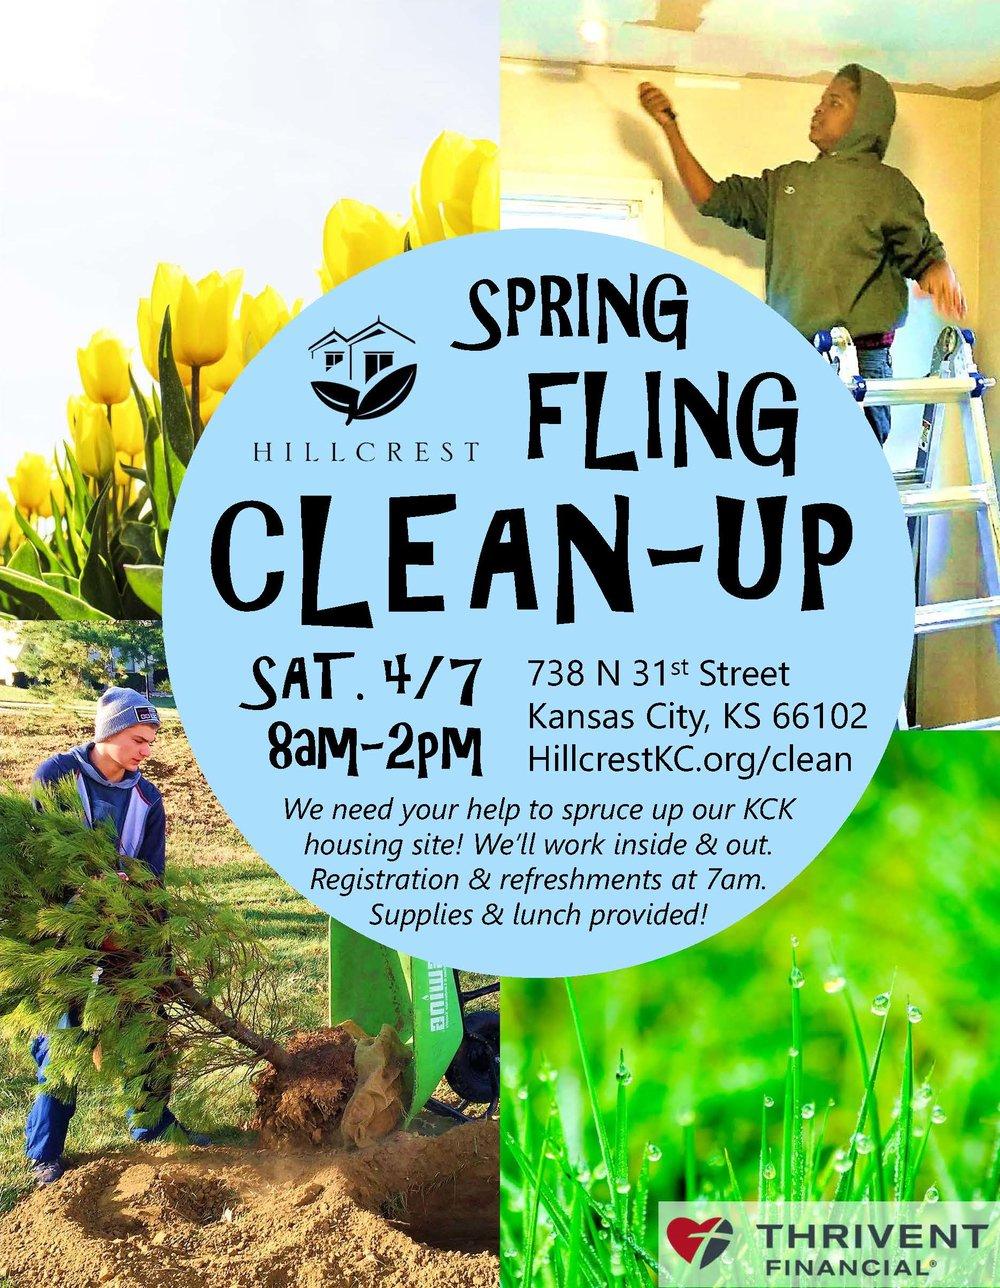 Hillcrest Spring Fling Clean-Up April 7, 2018_Kansas City, Kansas.jpg